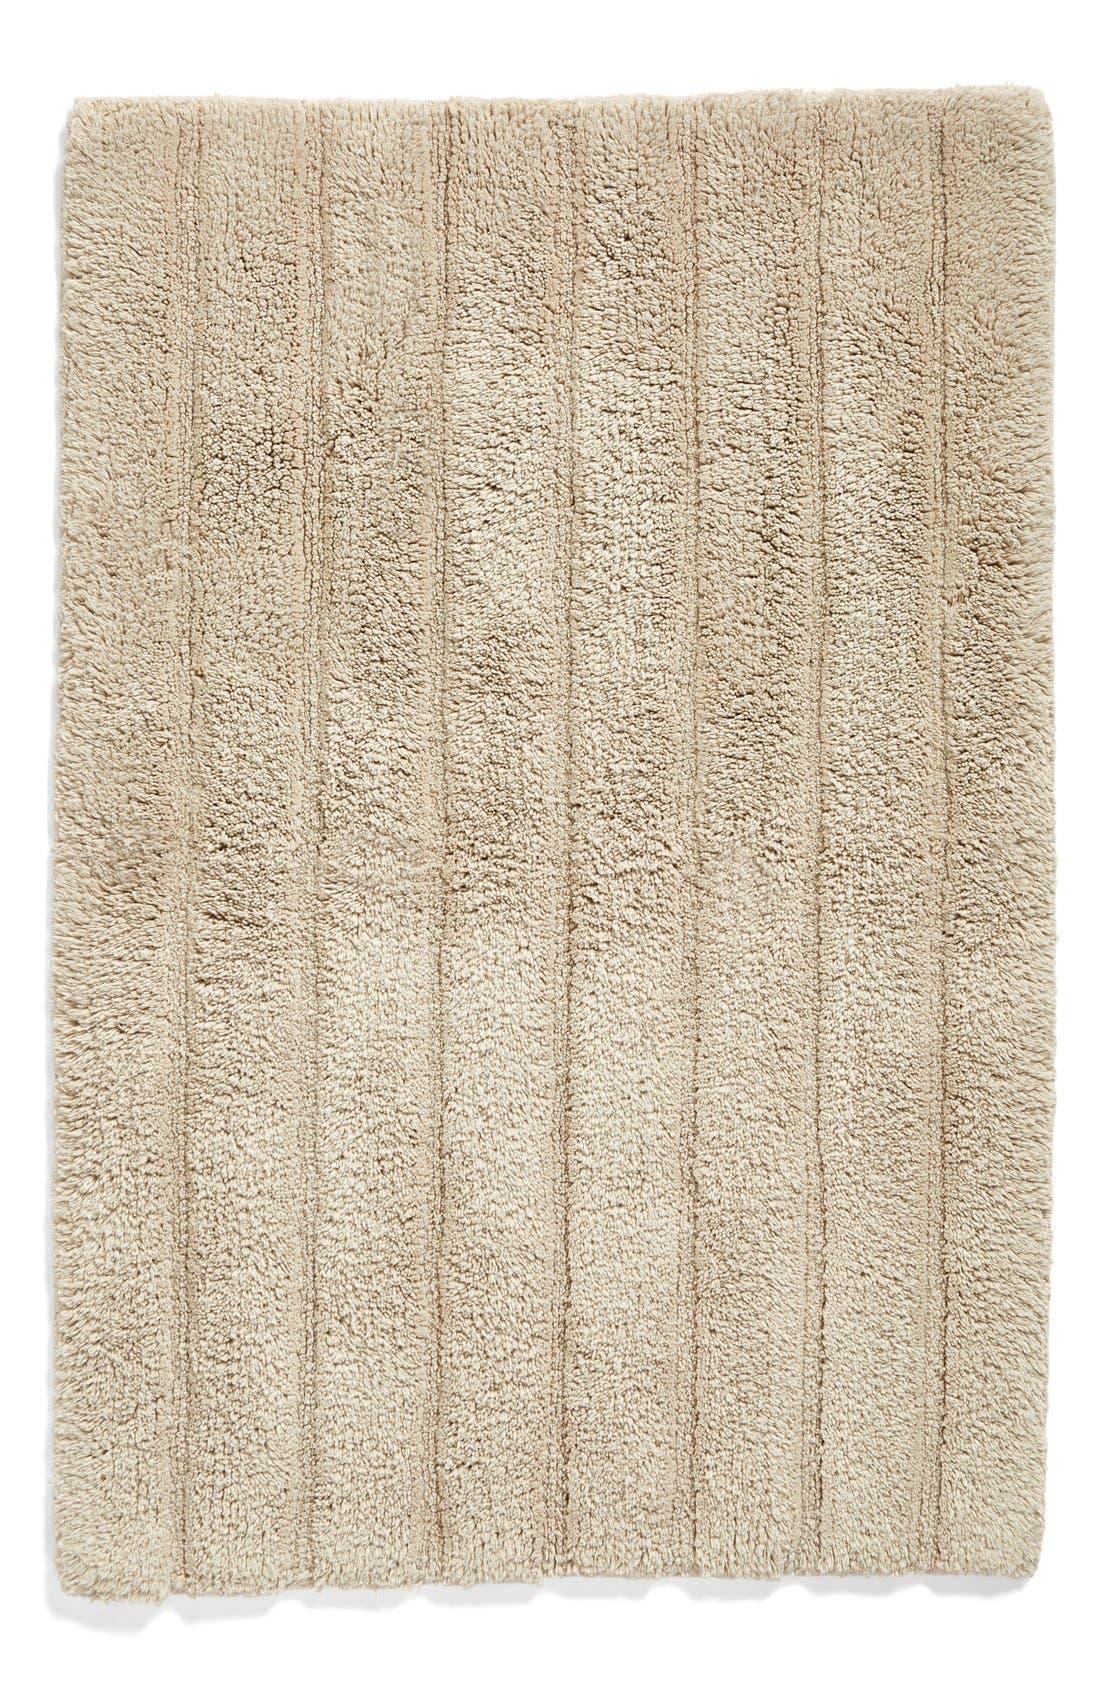 bath rugs & bath mats   nordstrom   nordstrom